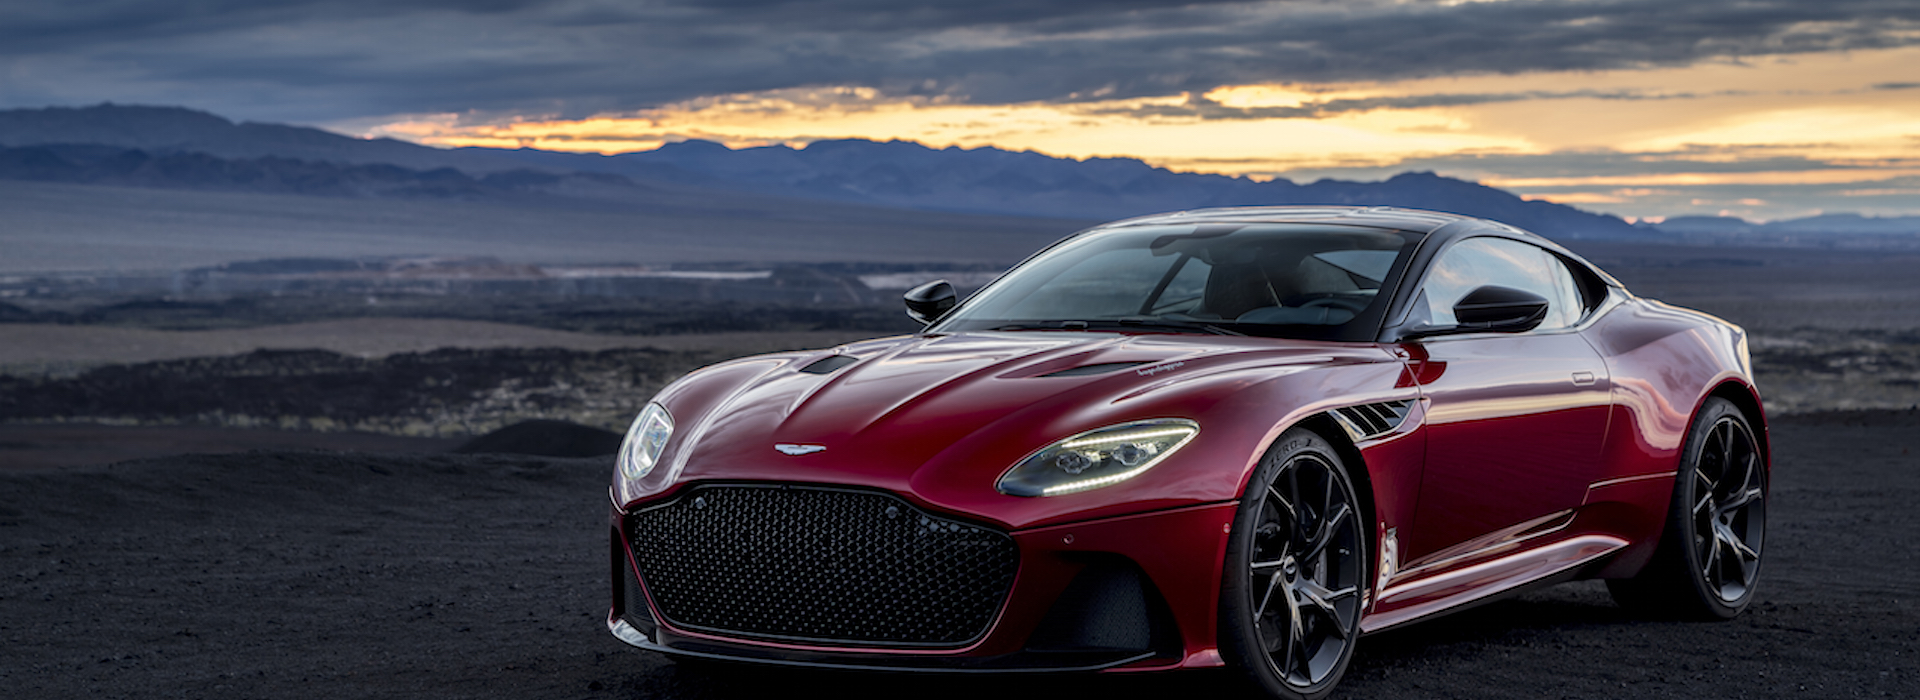 Aston Martin is making a comeback with the New DBS Superleggera